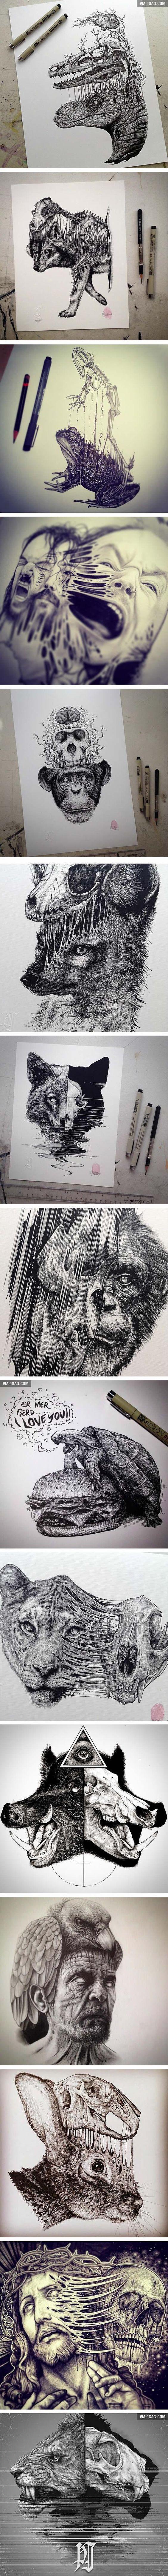 Animals Leave Their Skeletons Behind In These Stunning Dark Drawings (By Paul Jackson):